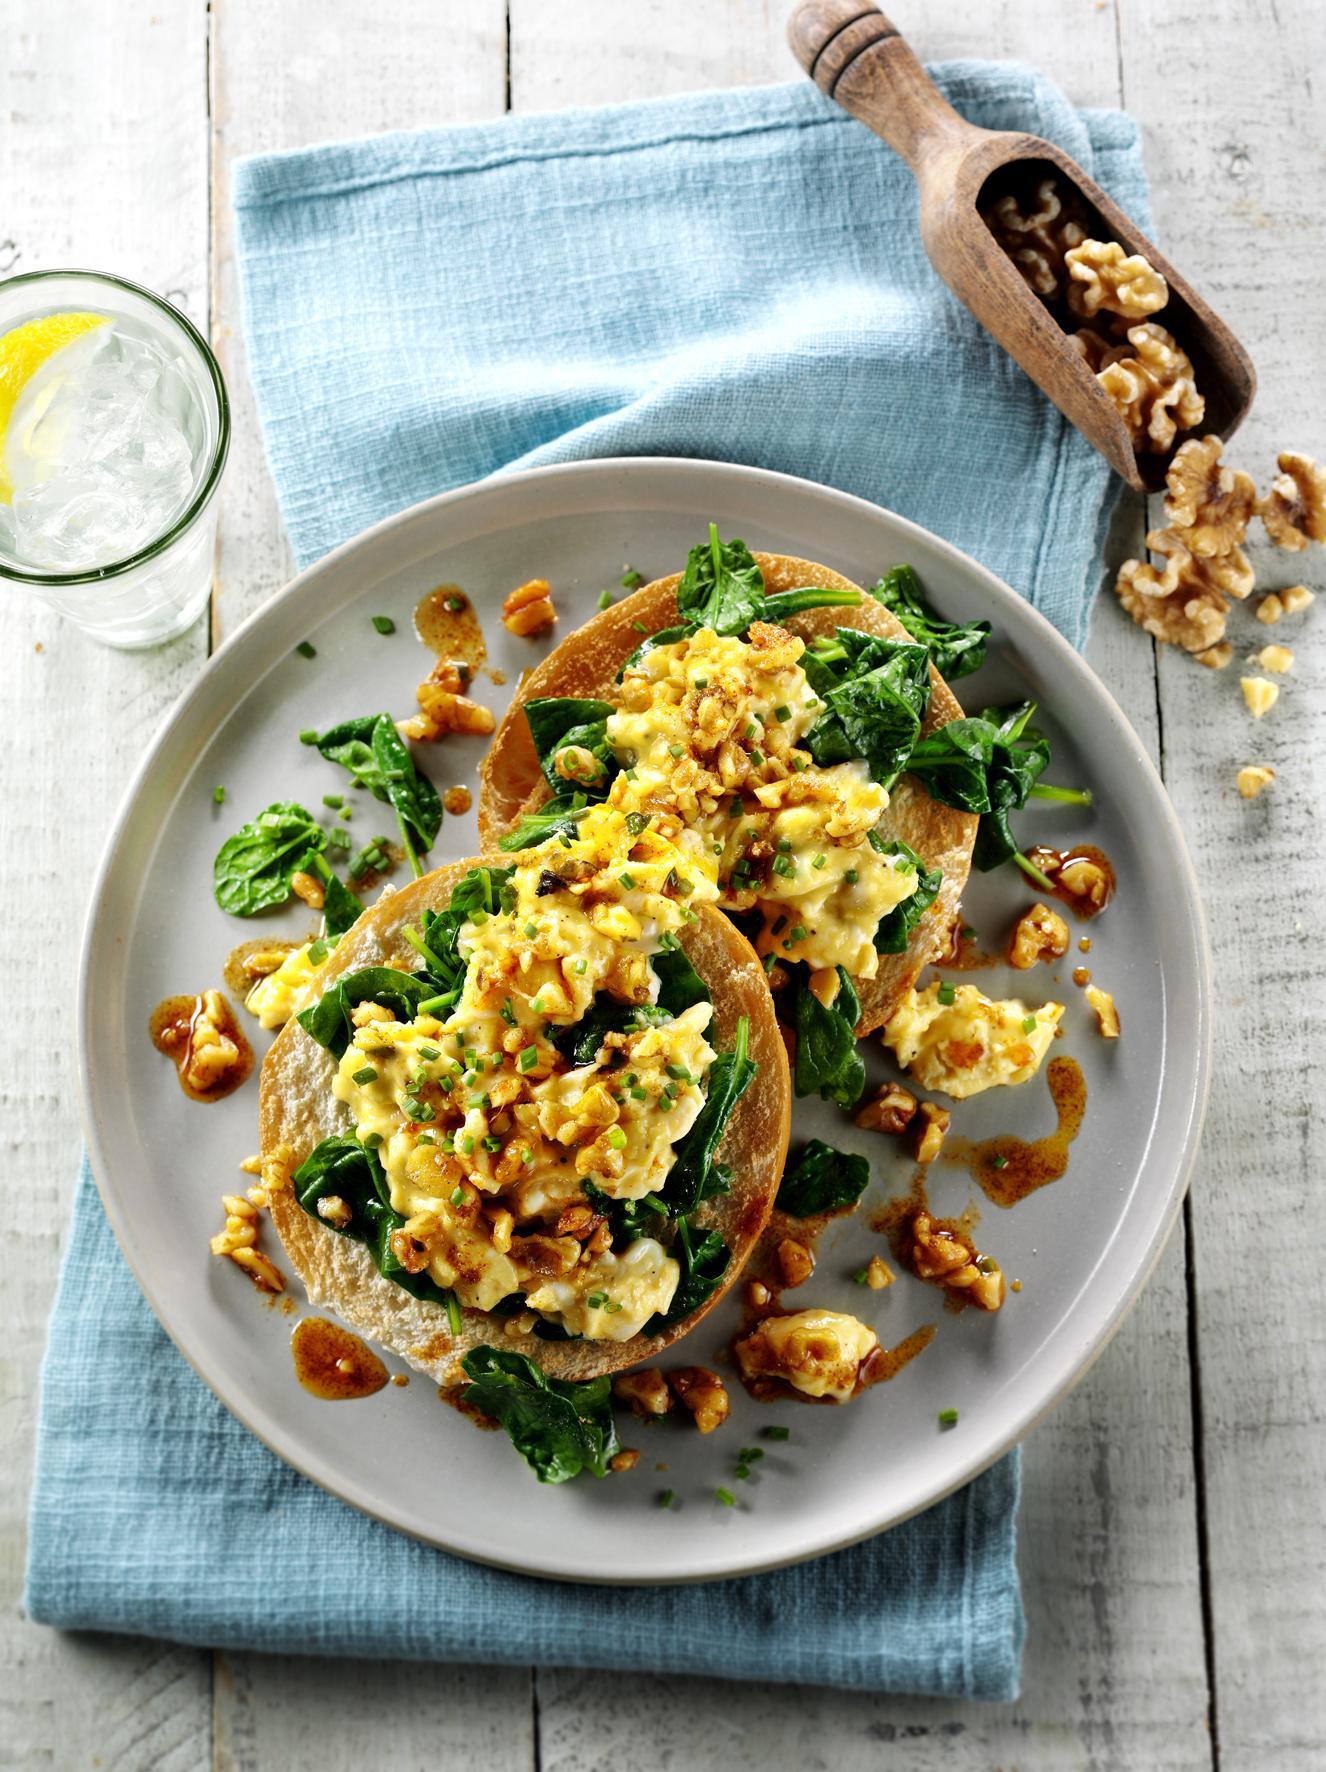 paprika-and-california-walnut-scrambled-egg-bagel_042920040421.jpg